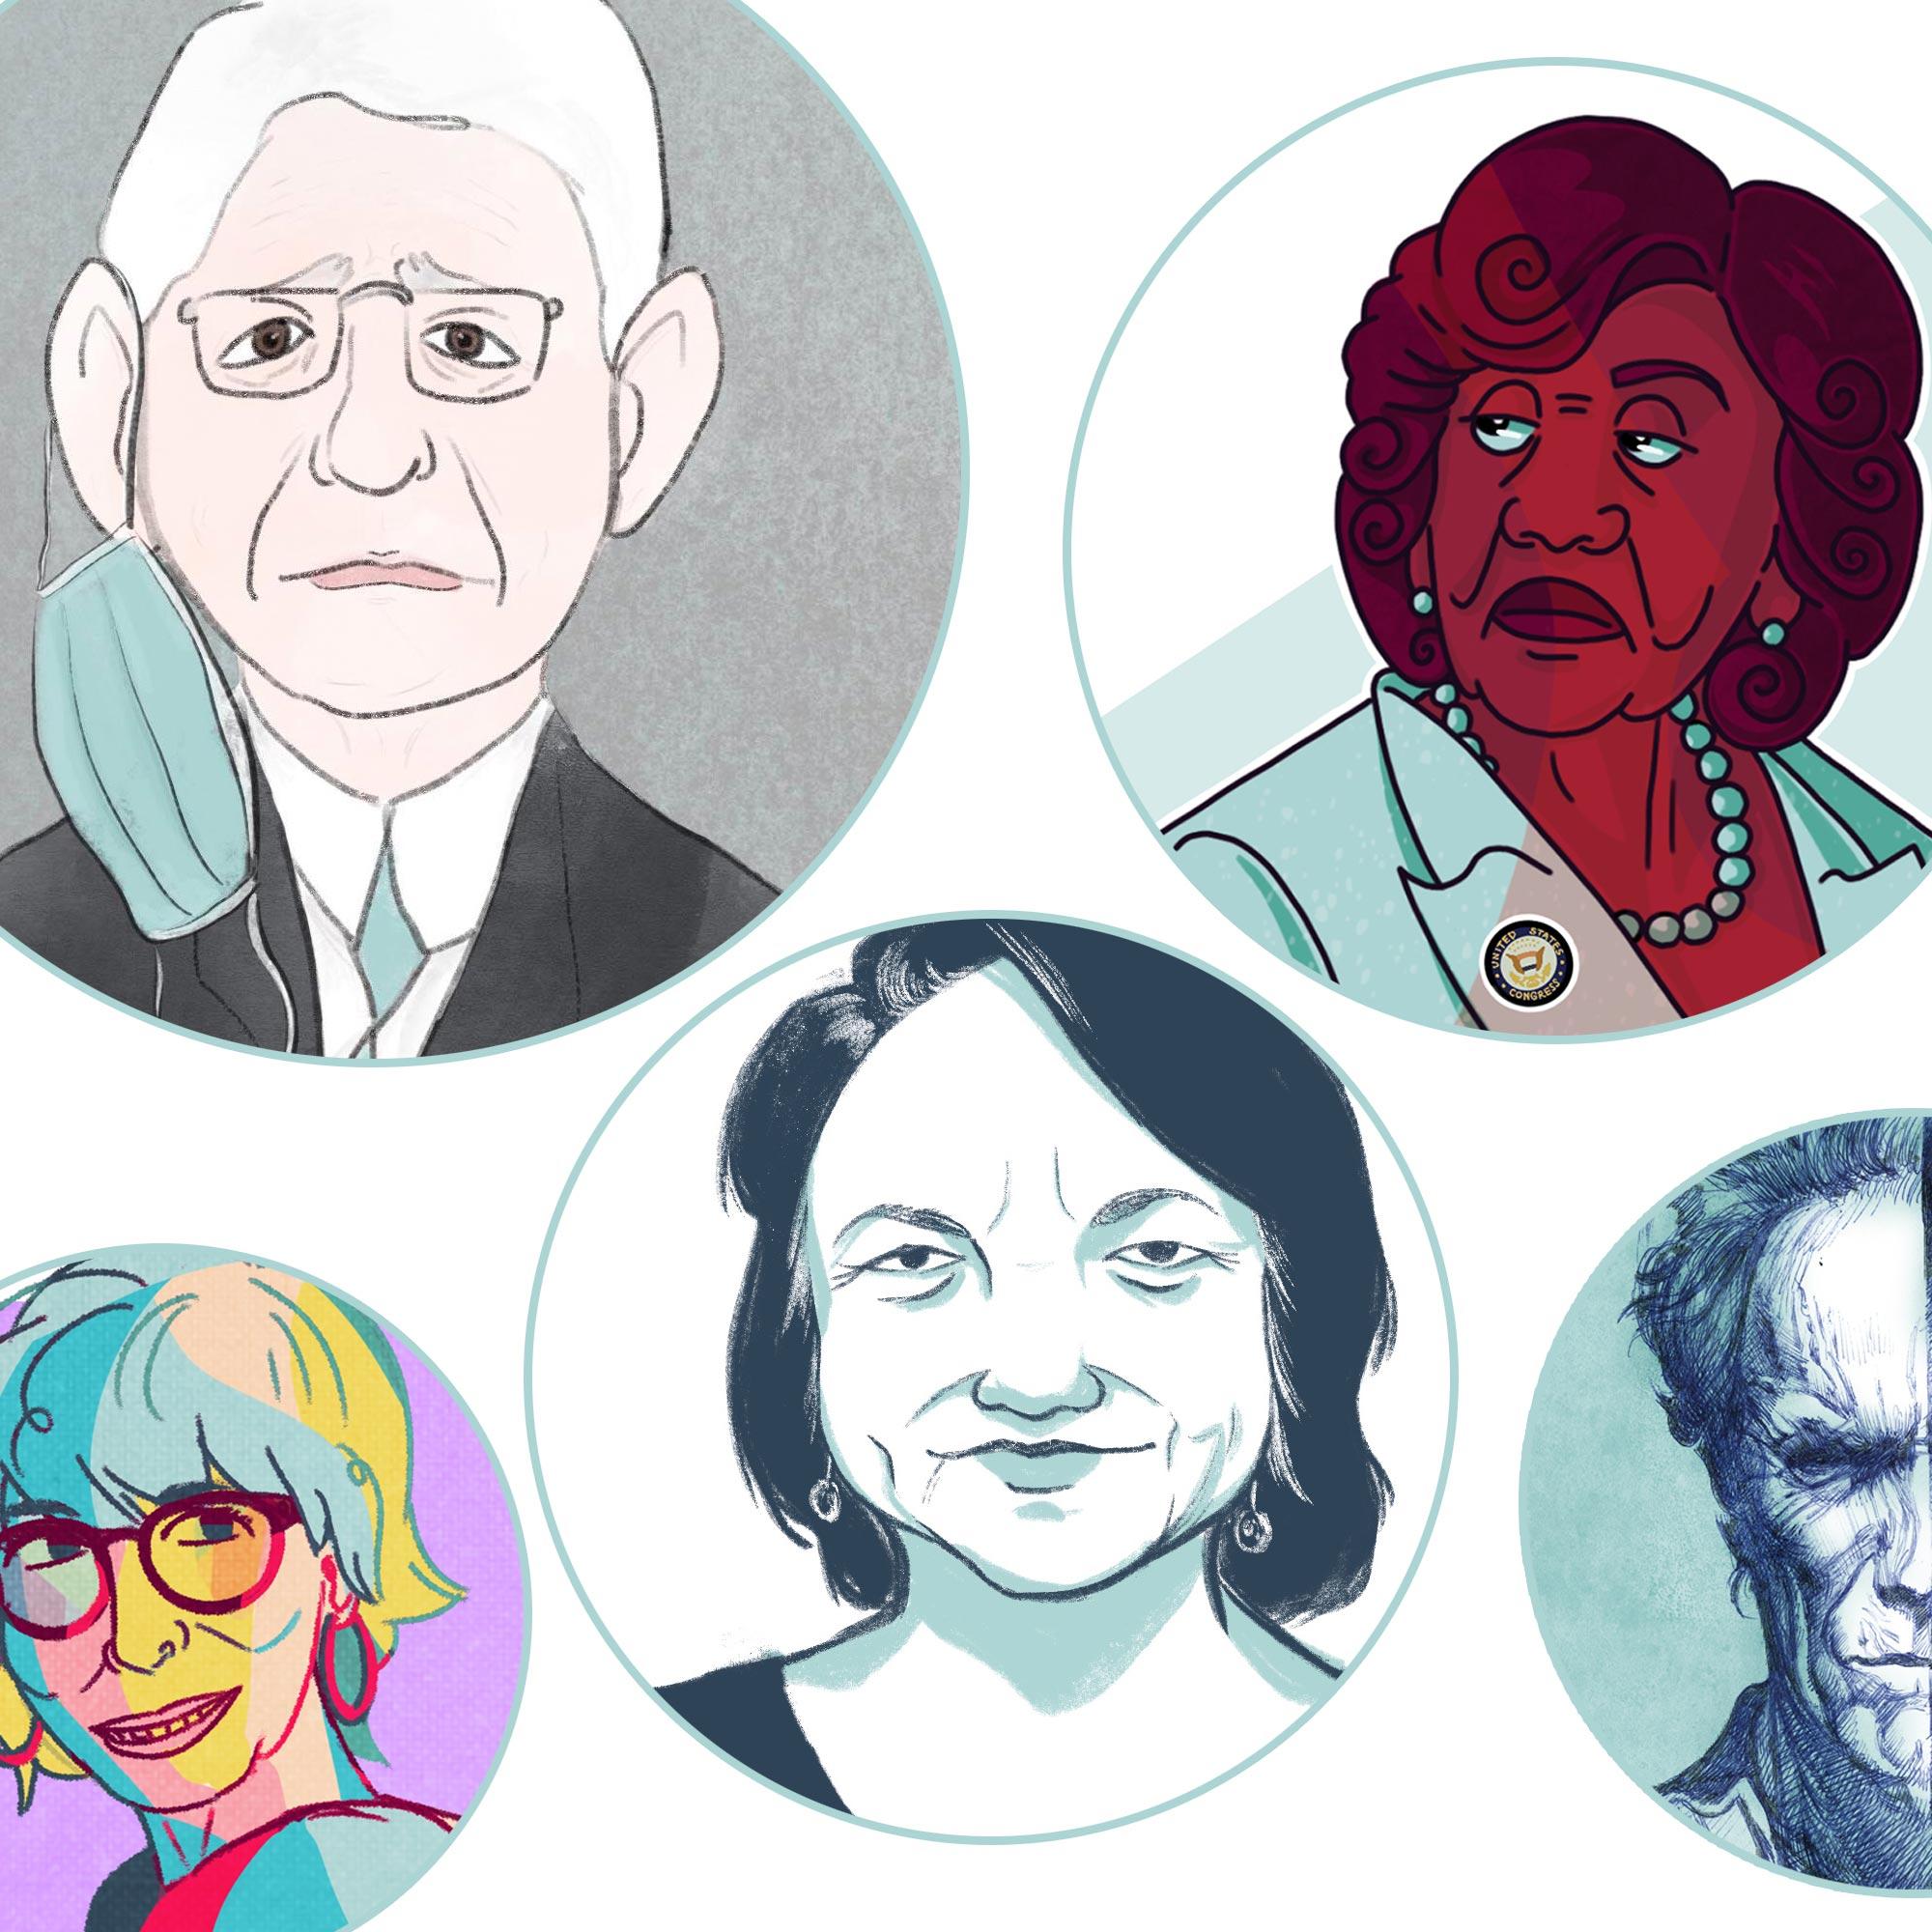 Illustrations of Fauci, Maxine Waters, Clint Eastwood, Dolores Huerta, and Rita Moreno